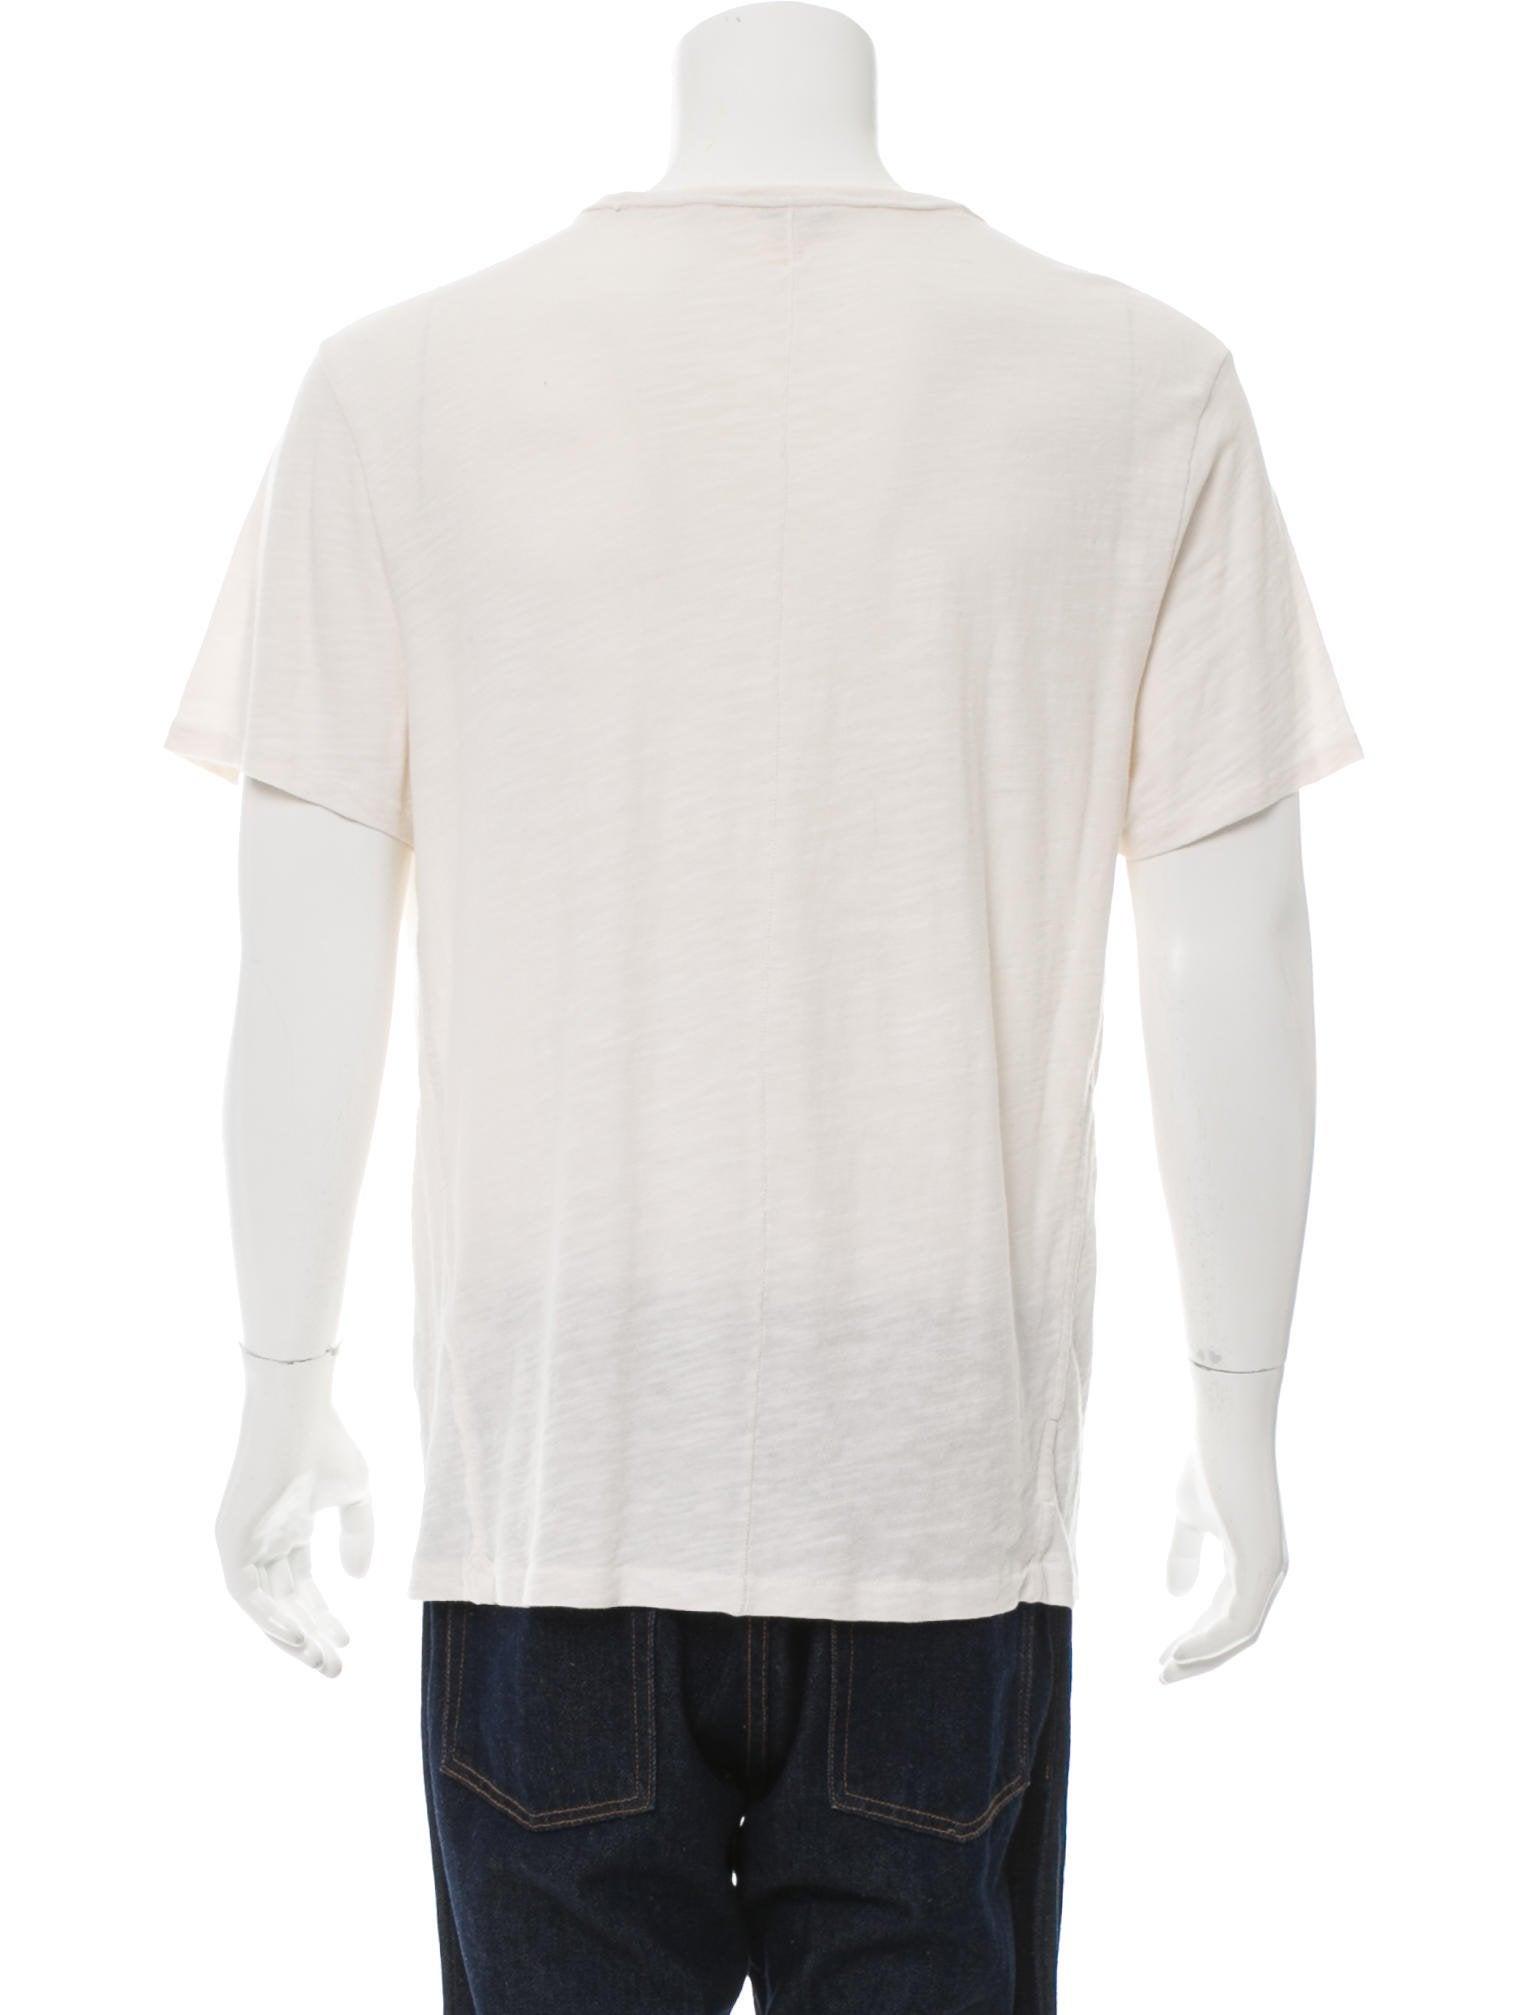 Rag Bone Graphic Crew Neck T Shirt Clothing